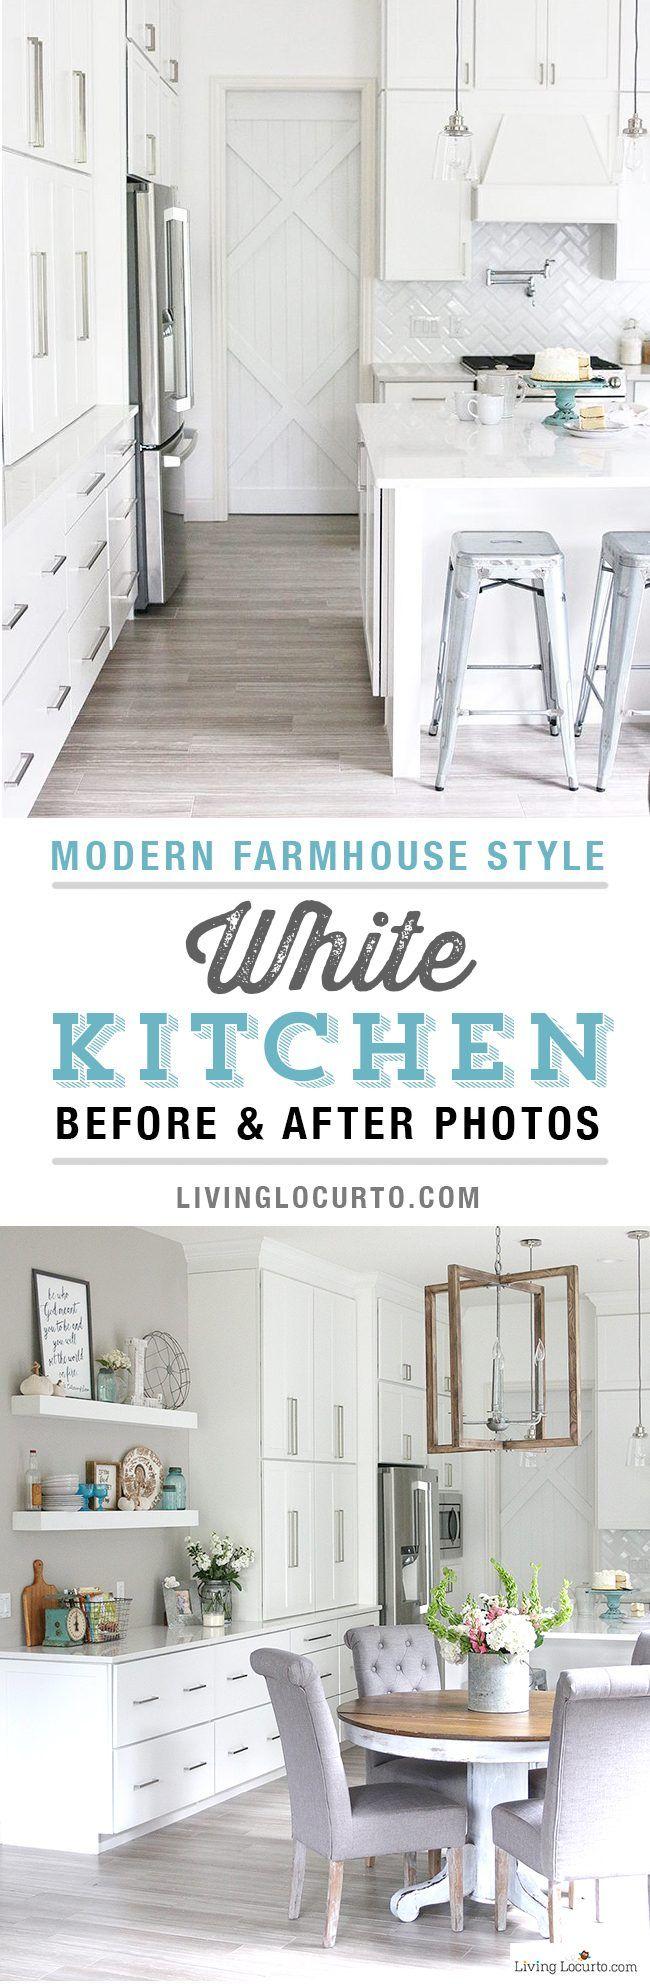 44 best HOME: dream kitchen images on Pinterest | Dream kitchens ...